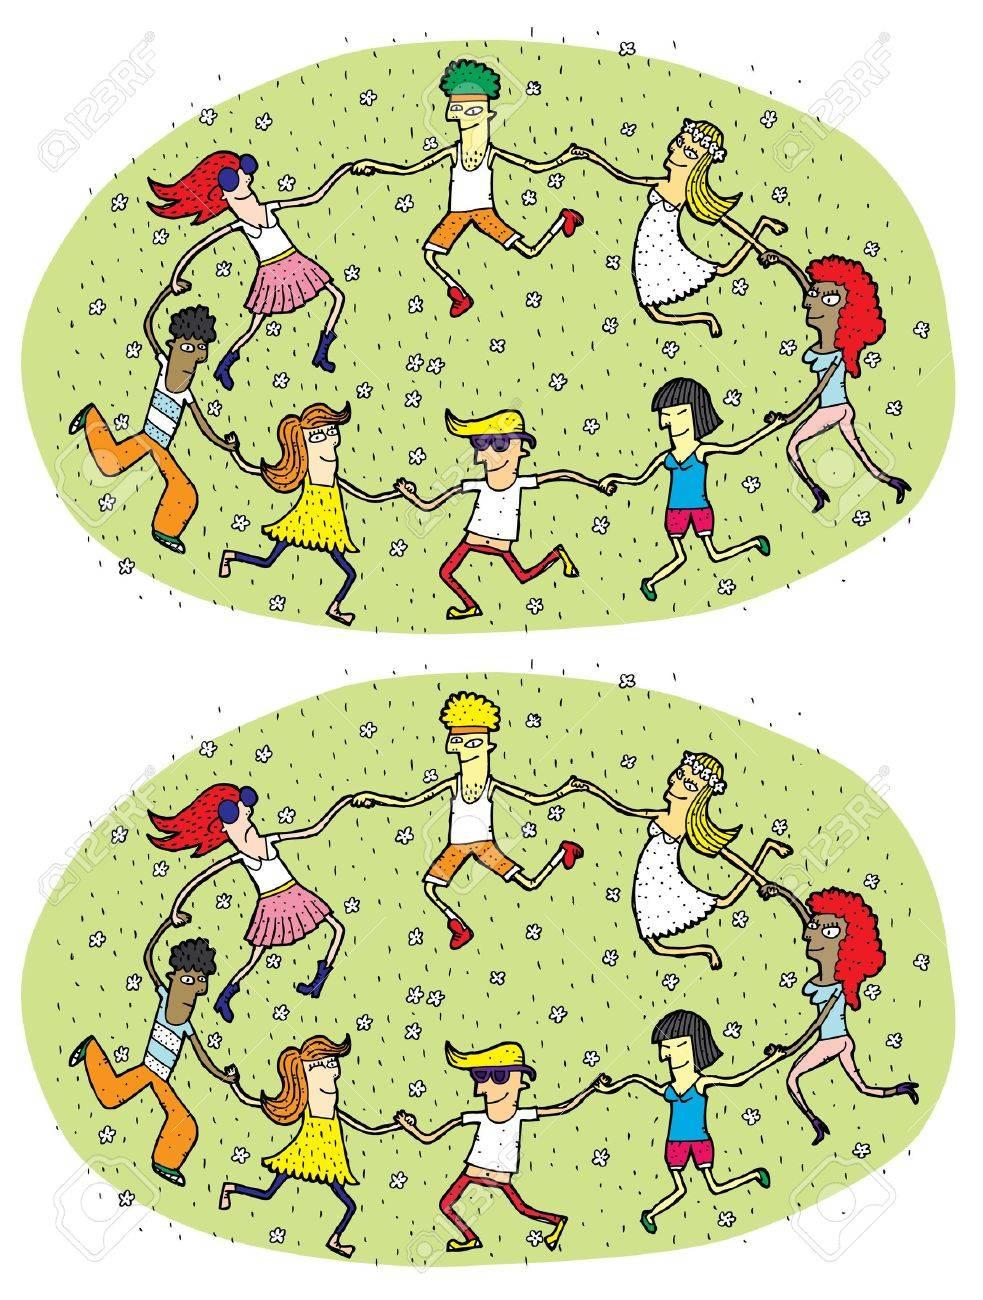 Dance Mind Game for Children Task Find 10 Differences